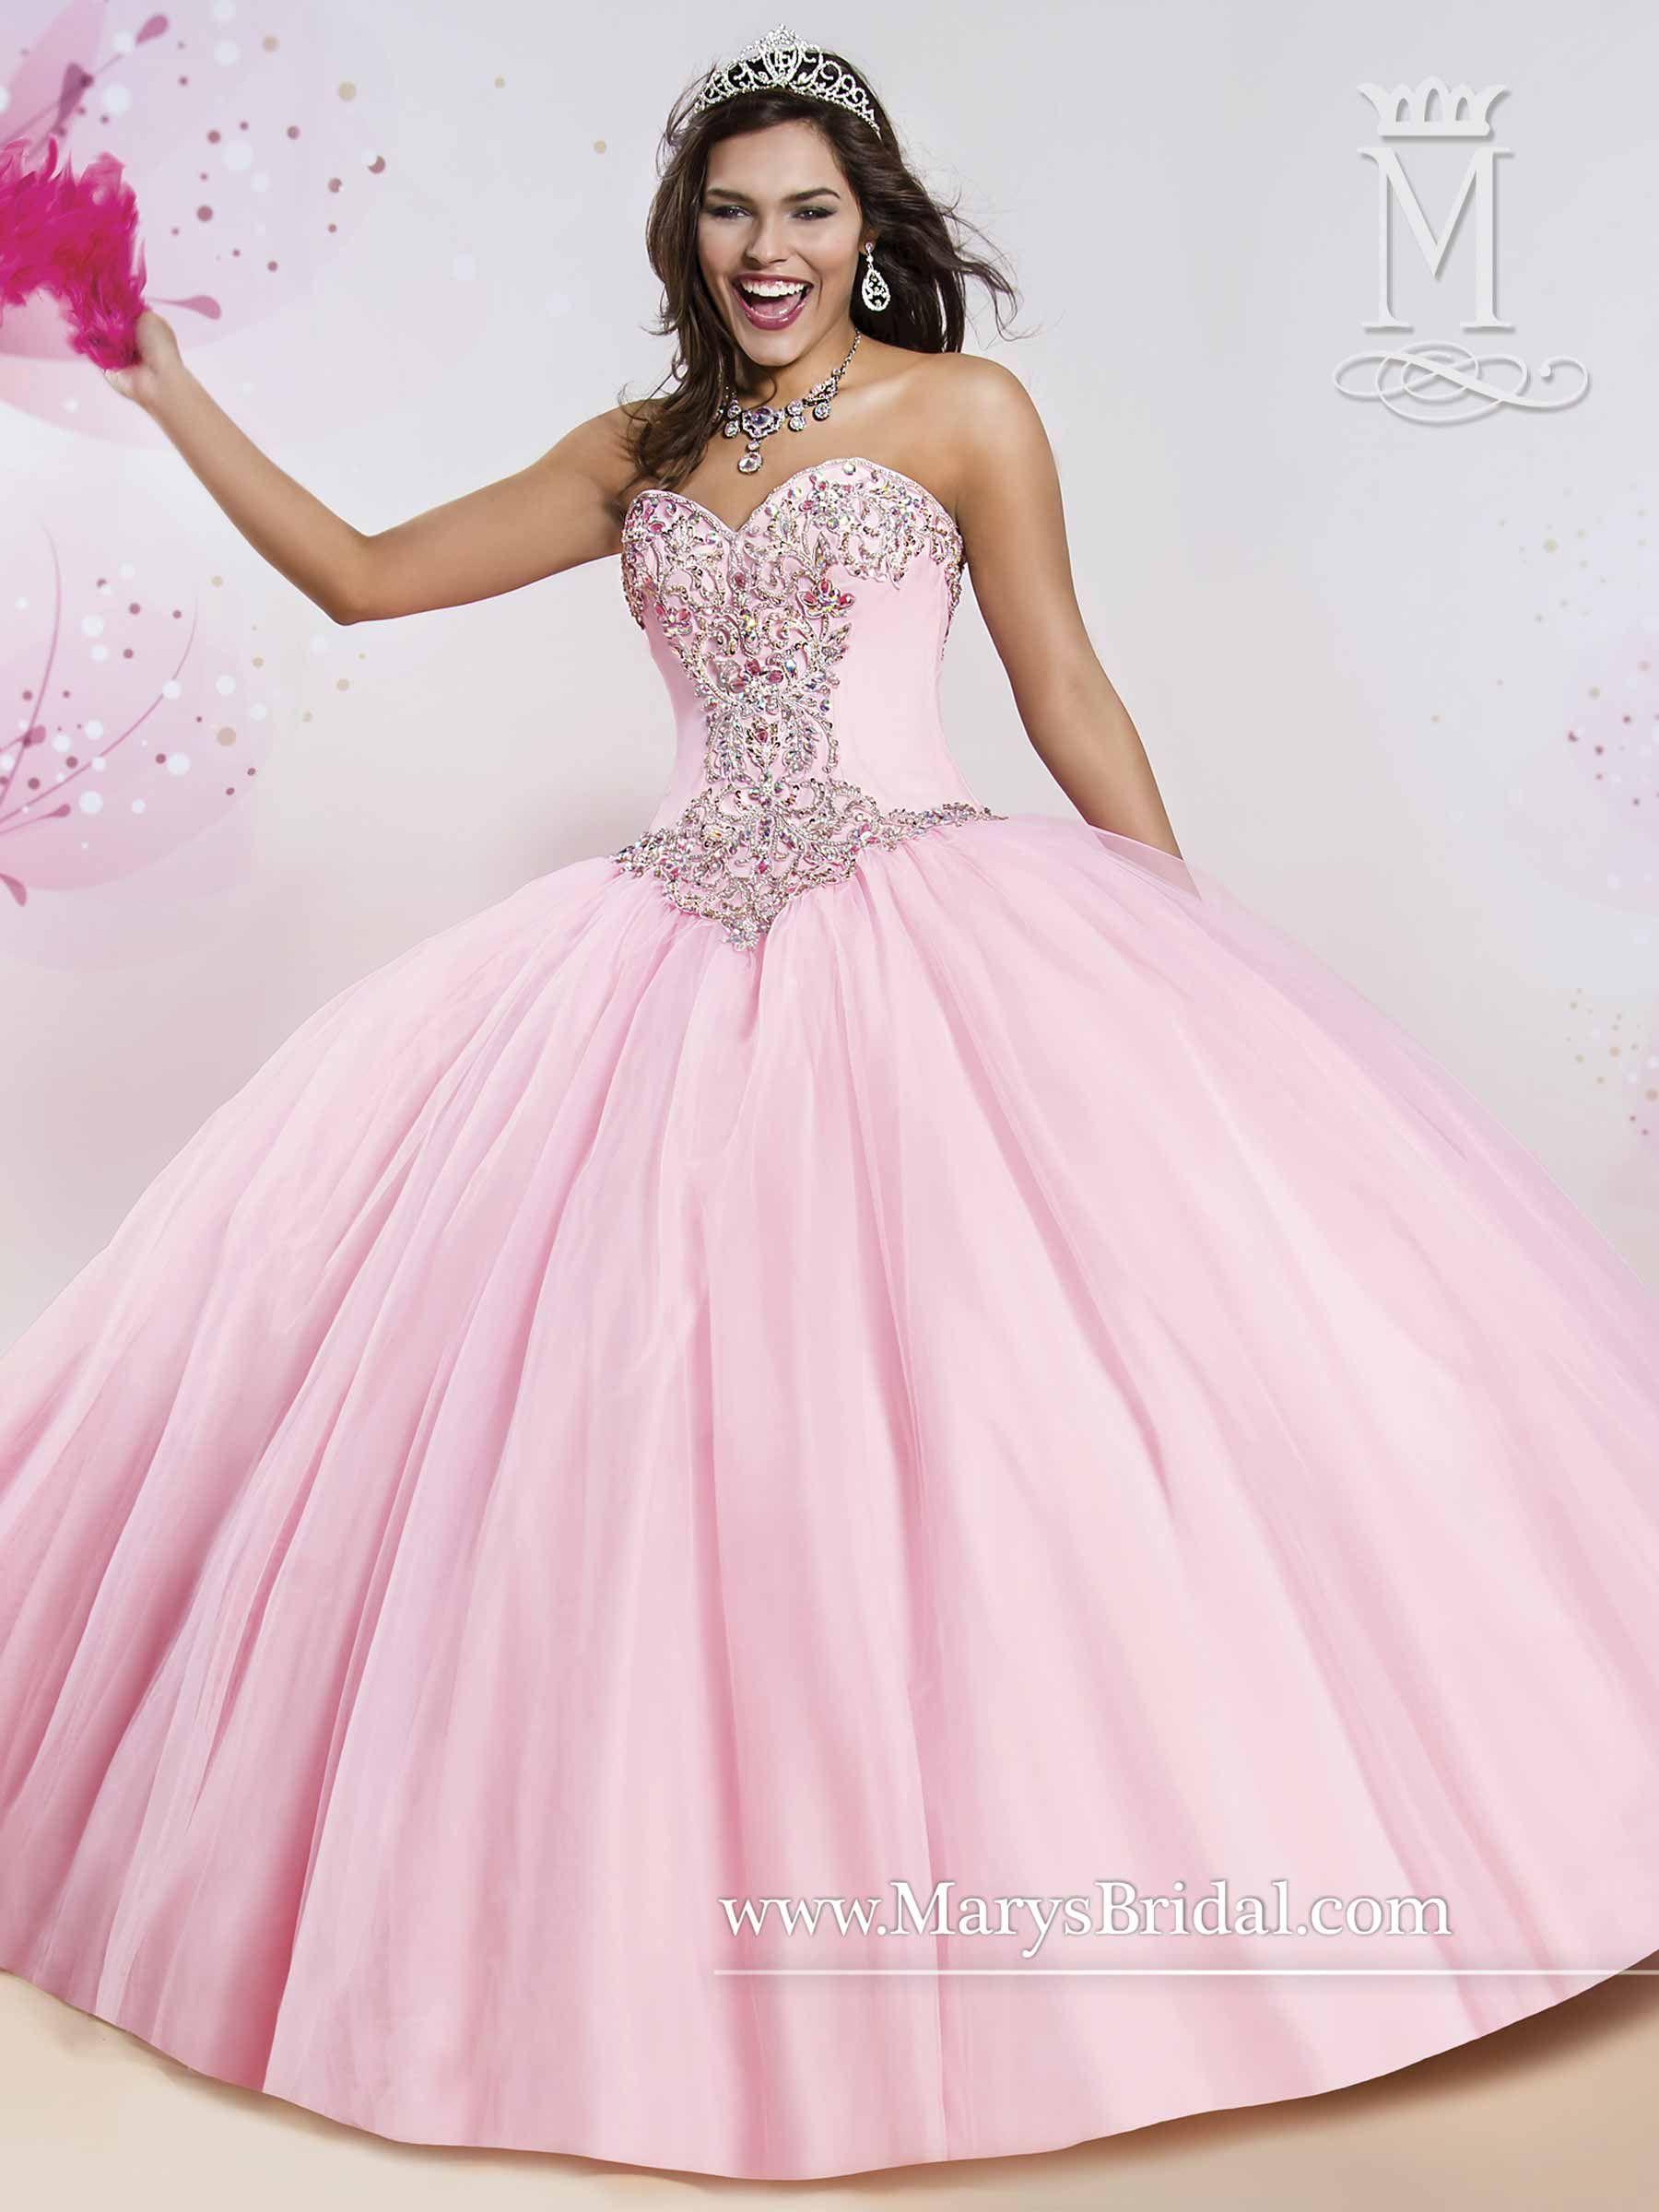 Mary's Bridal pink quinceañera dress   Quinceanera ❤   Pinterest ...